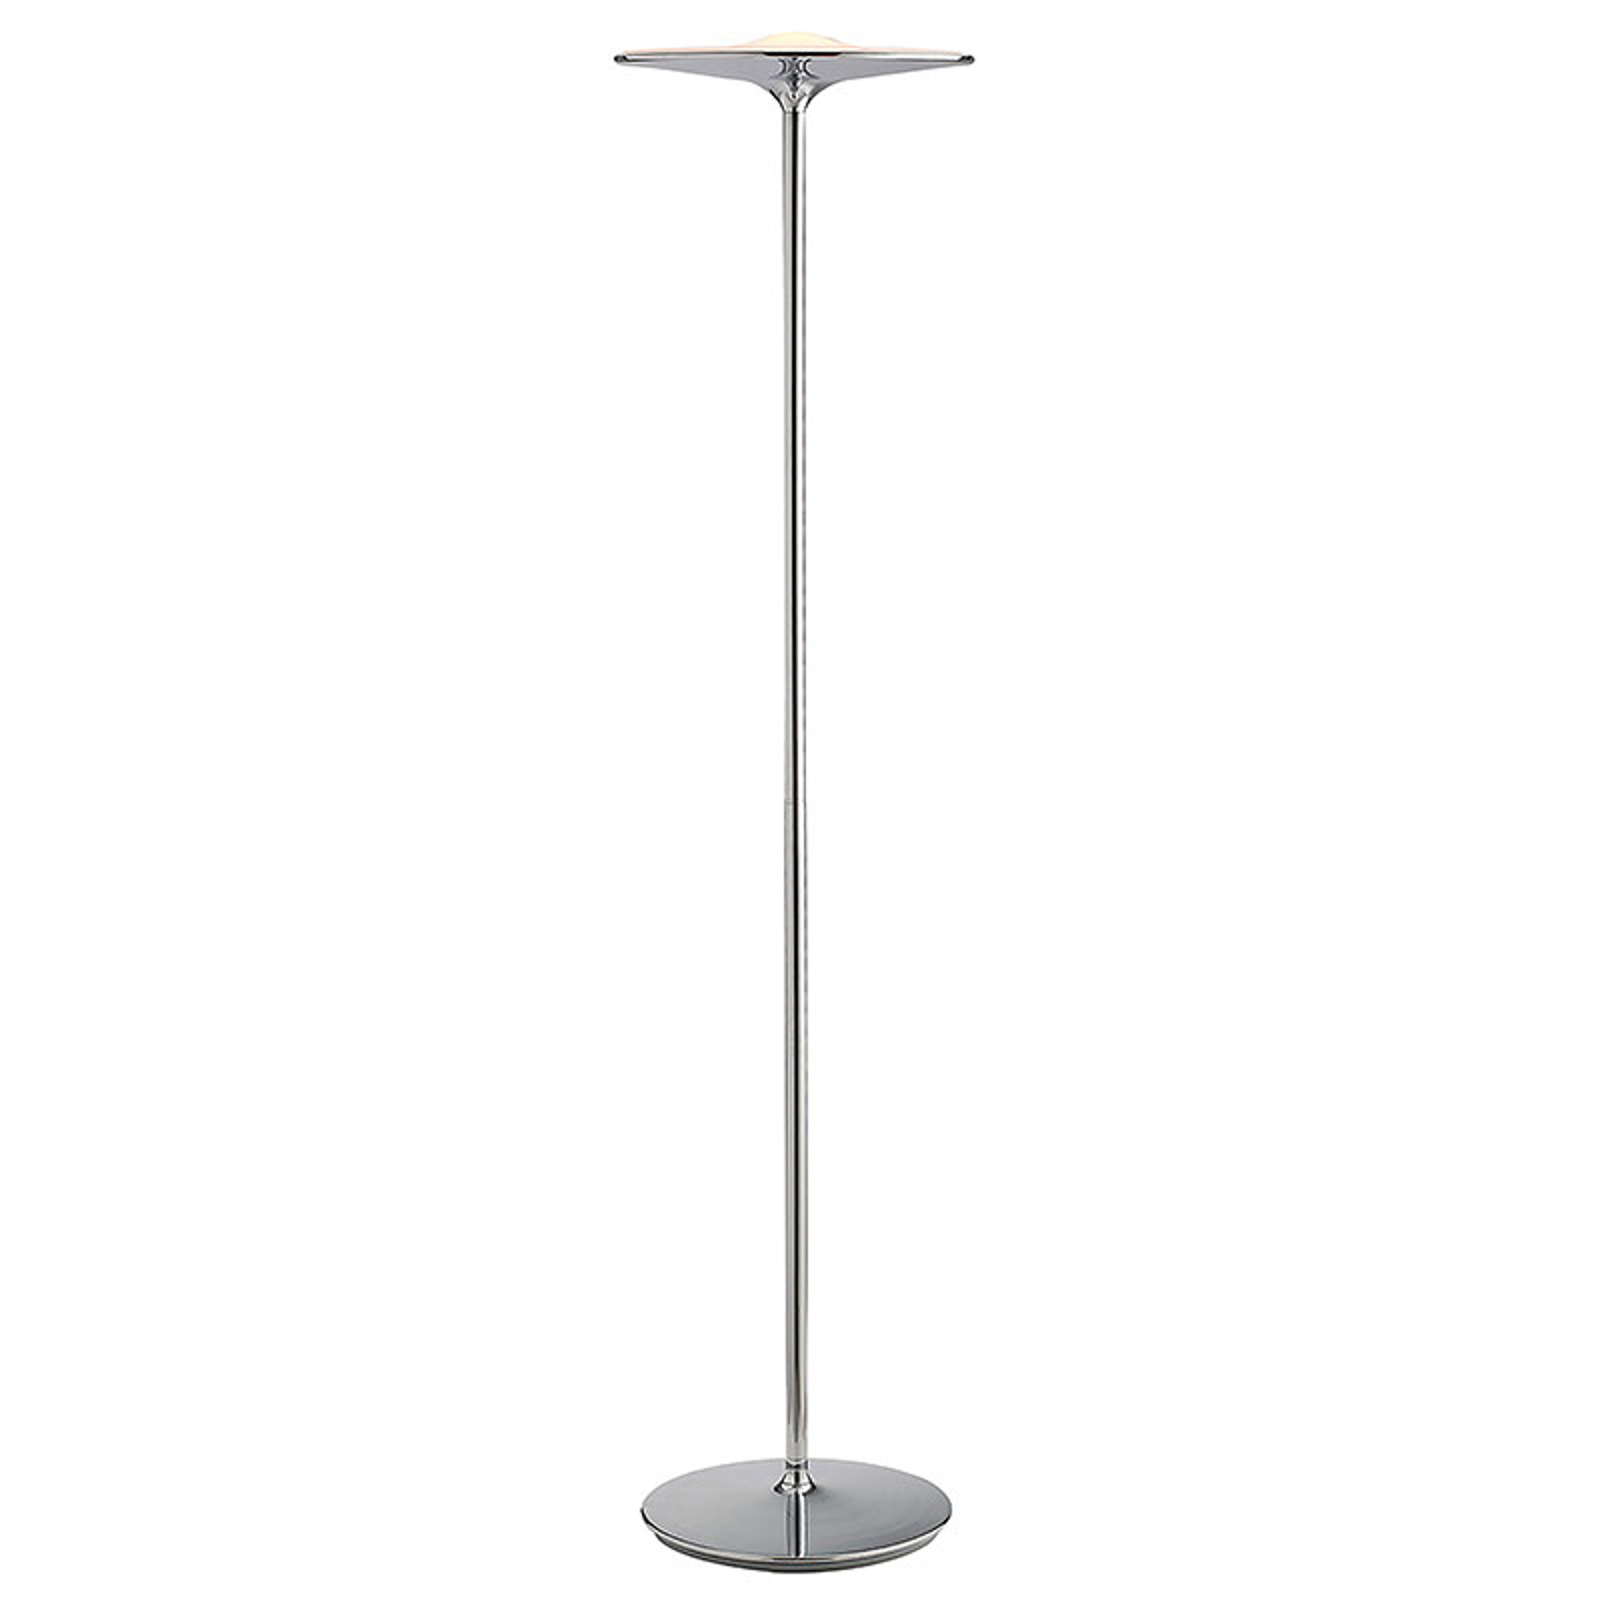 LED-gulvlampe Ikon med kromfinish